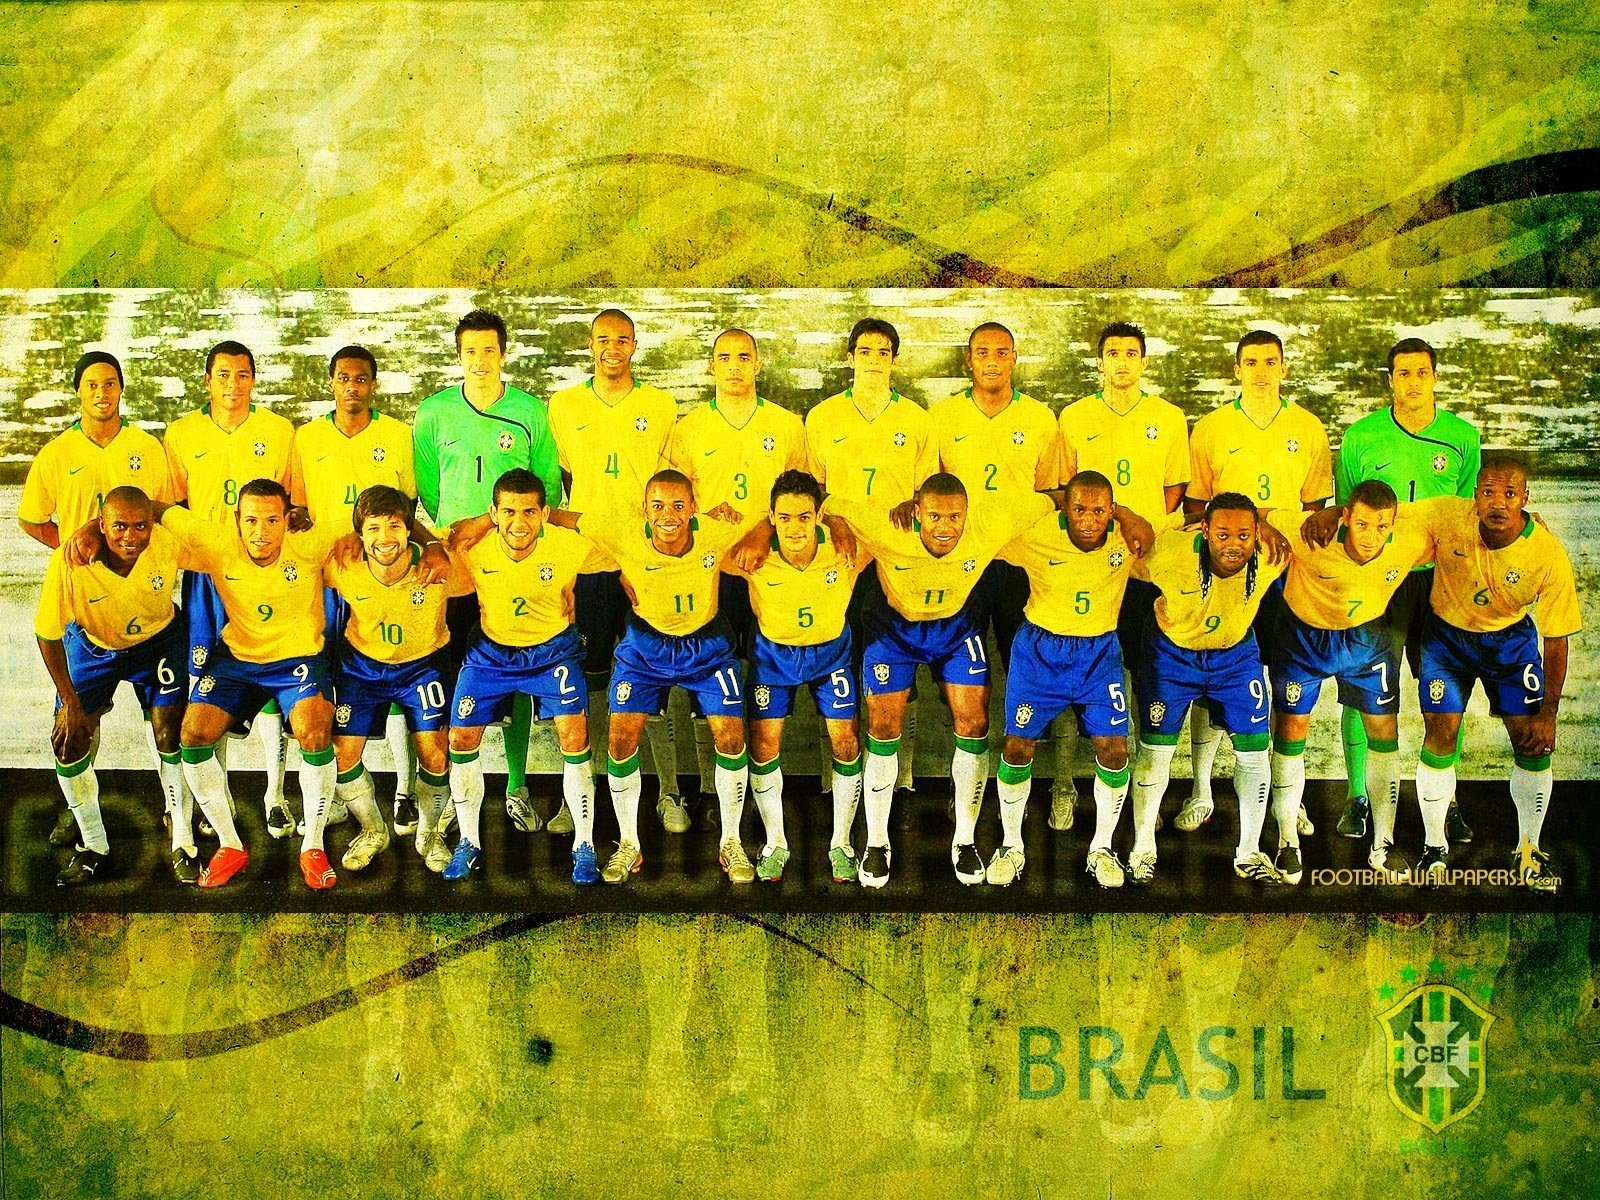 America Soccer Team Wallpaper 7 1600x1200